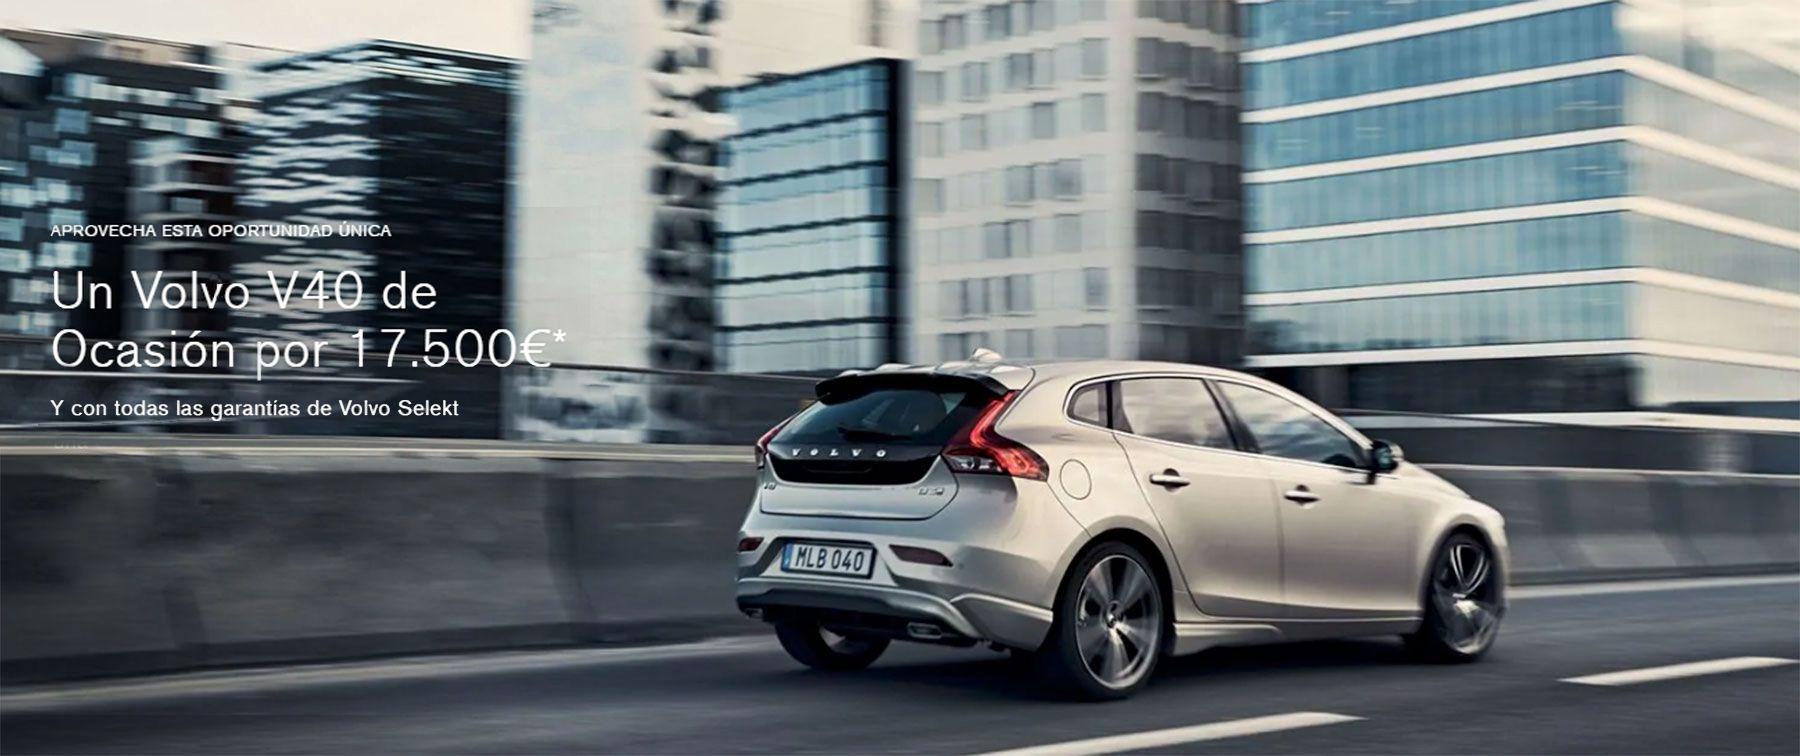 Un Volvo V40 de Ocasión por 17.500€*